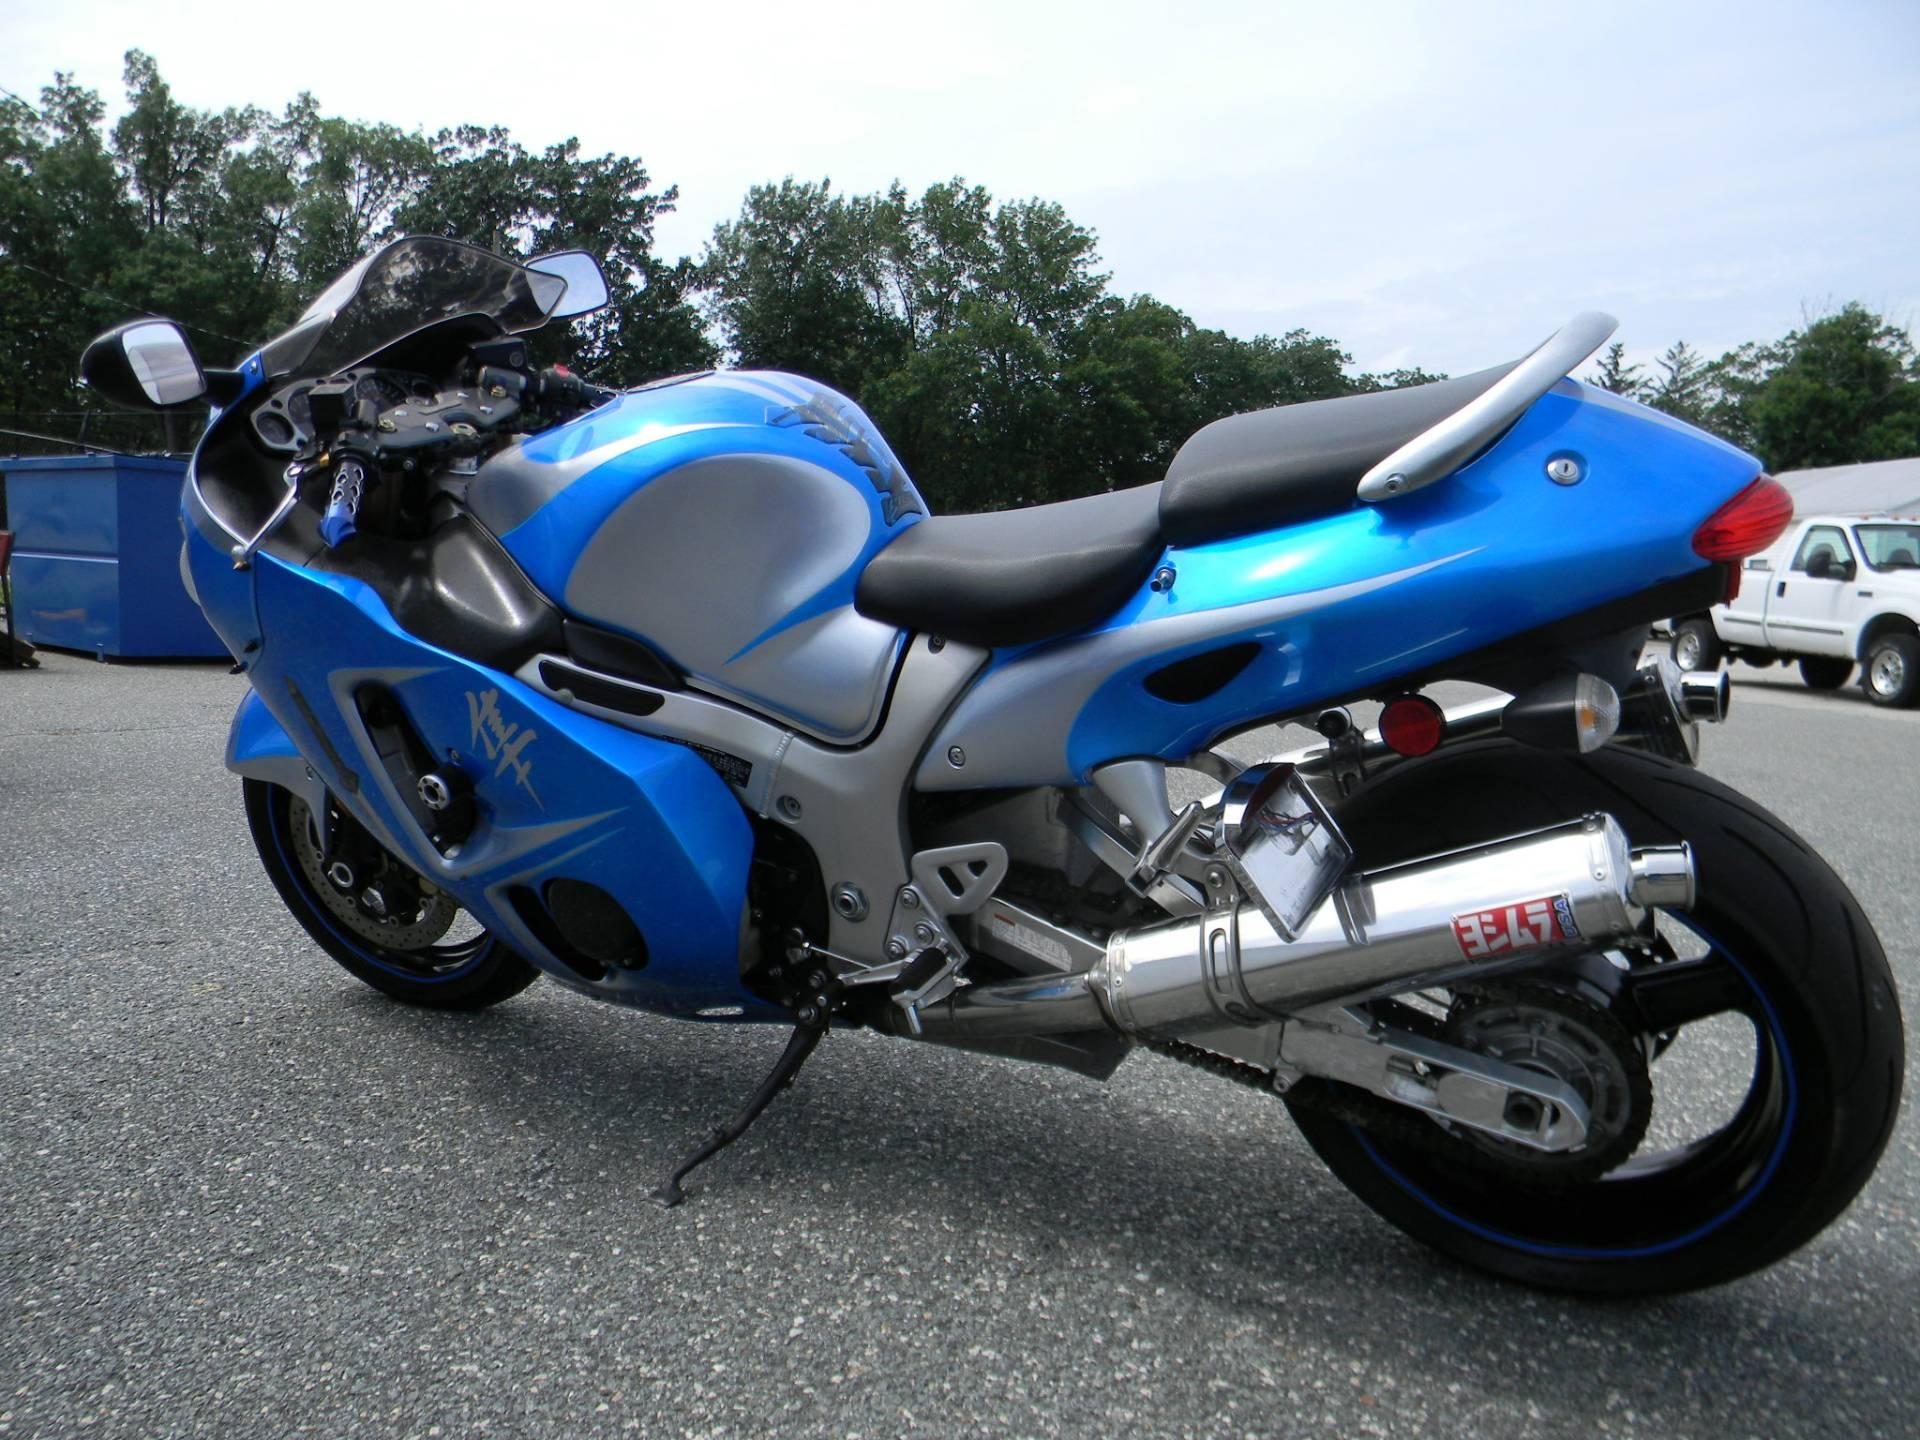 2005 Suzuki Hayabusa 6